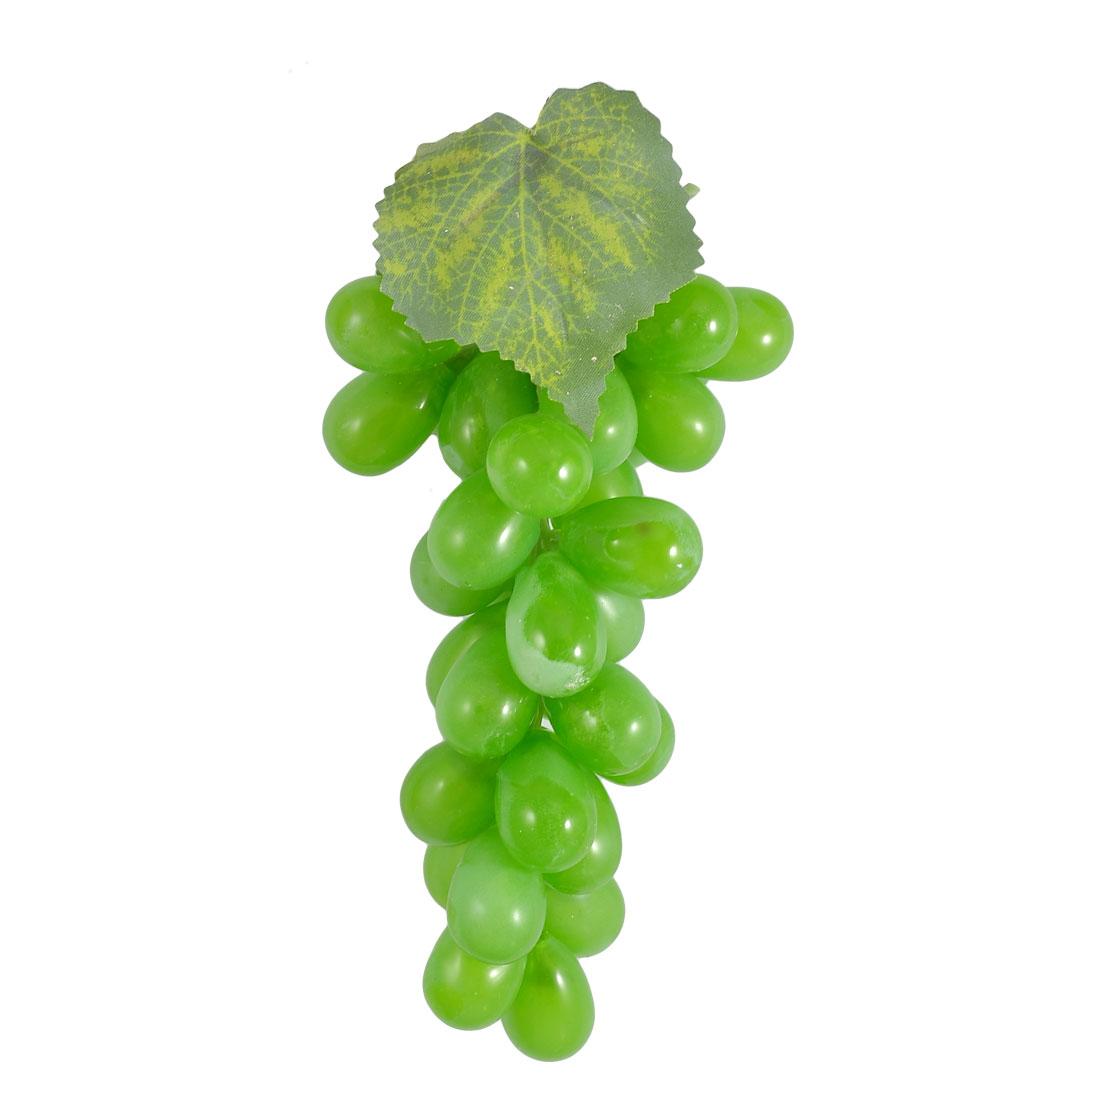 Emulational Green Soft Plastic Grape Fruit Shape Home Desk Ornament